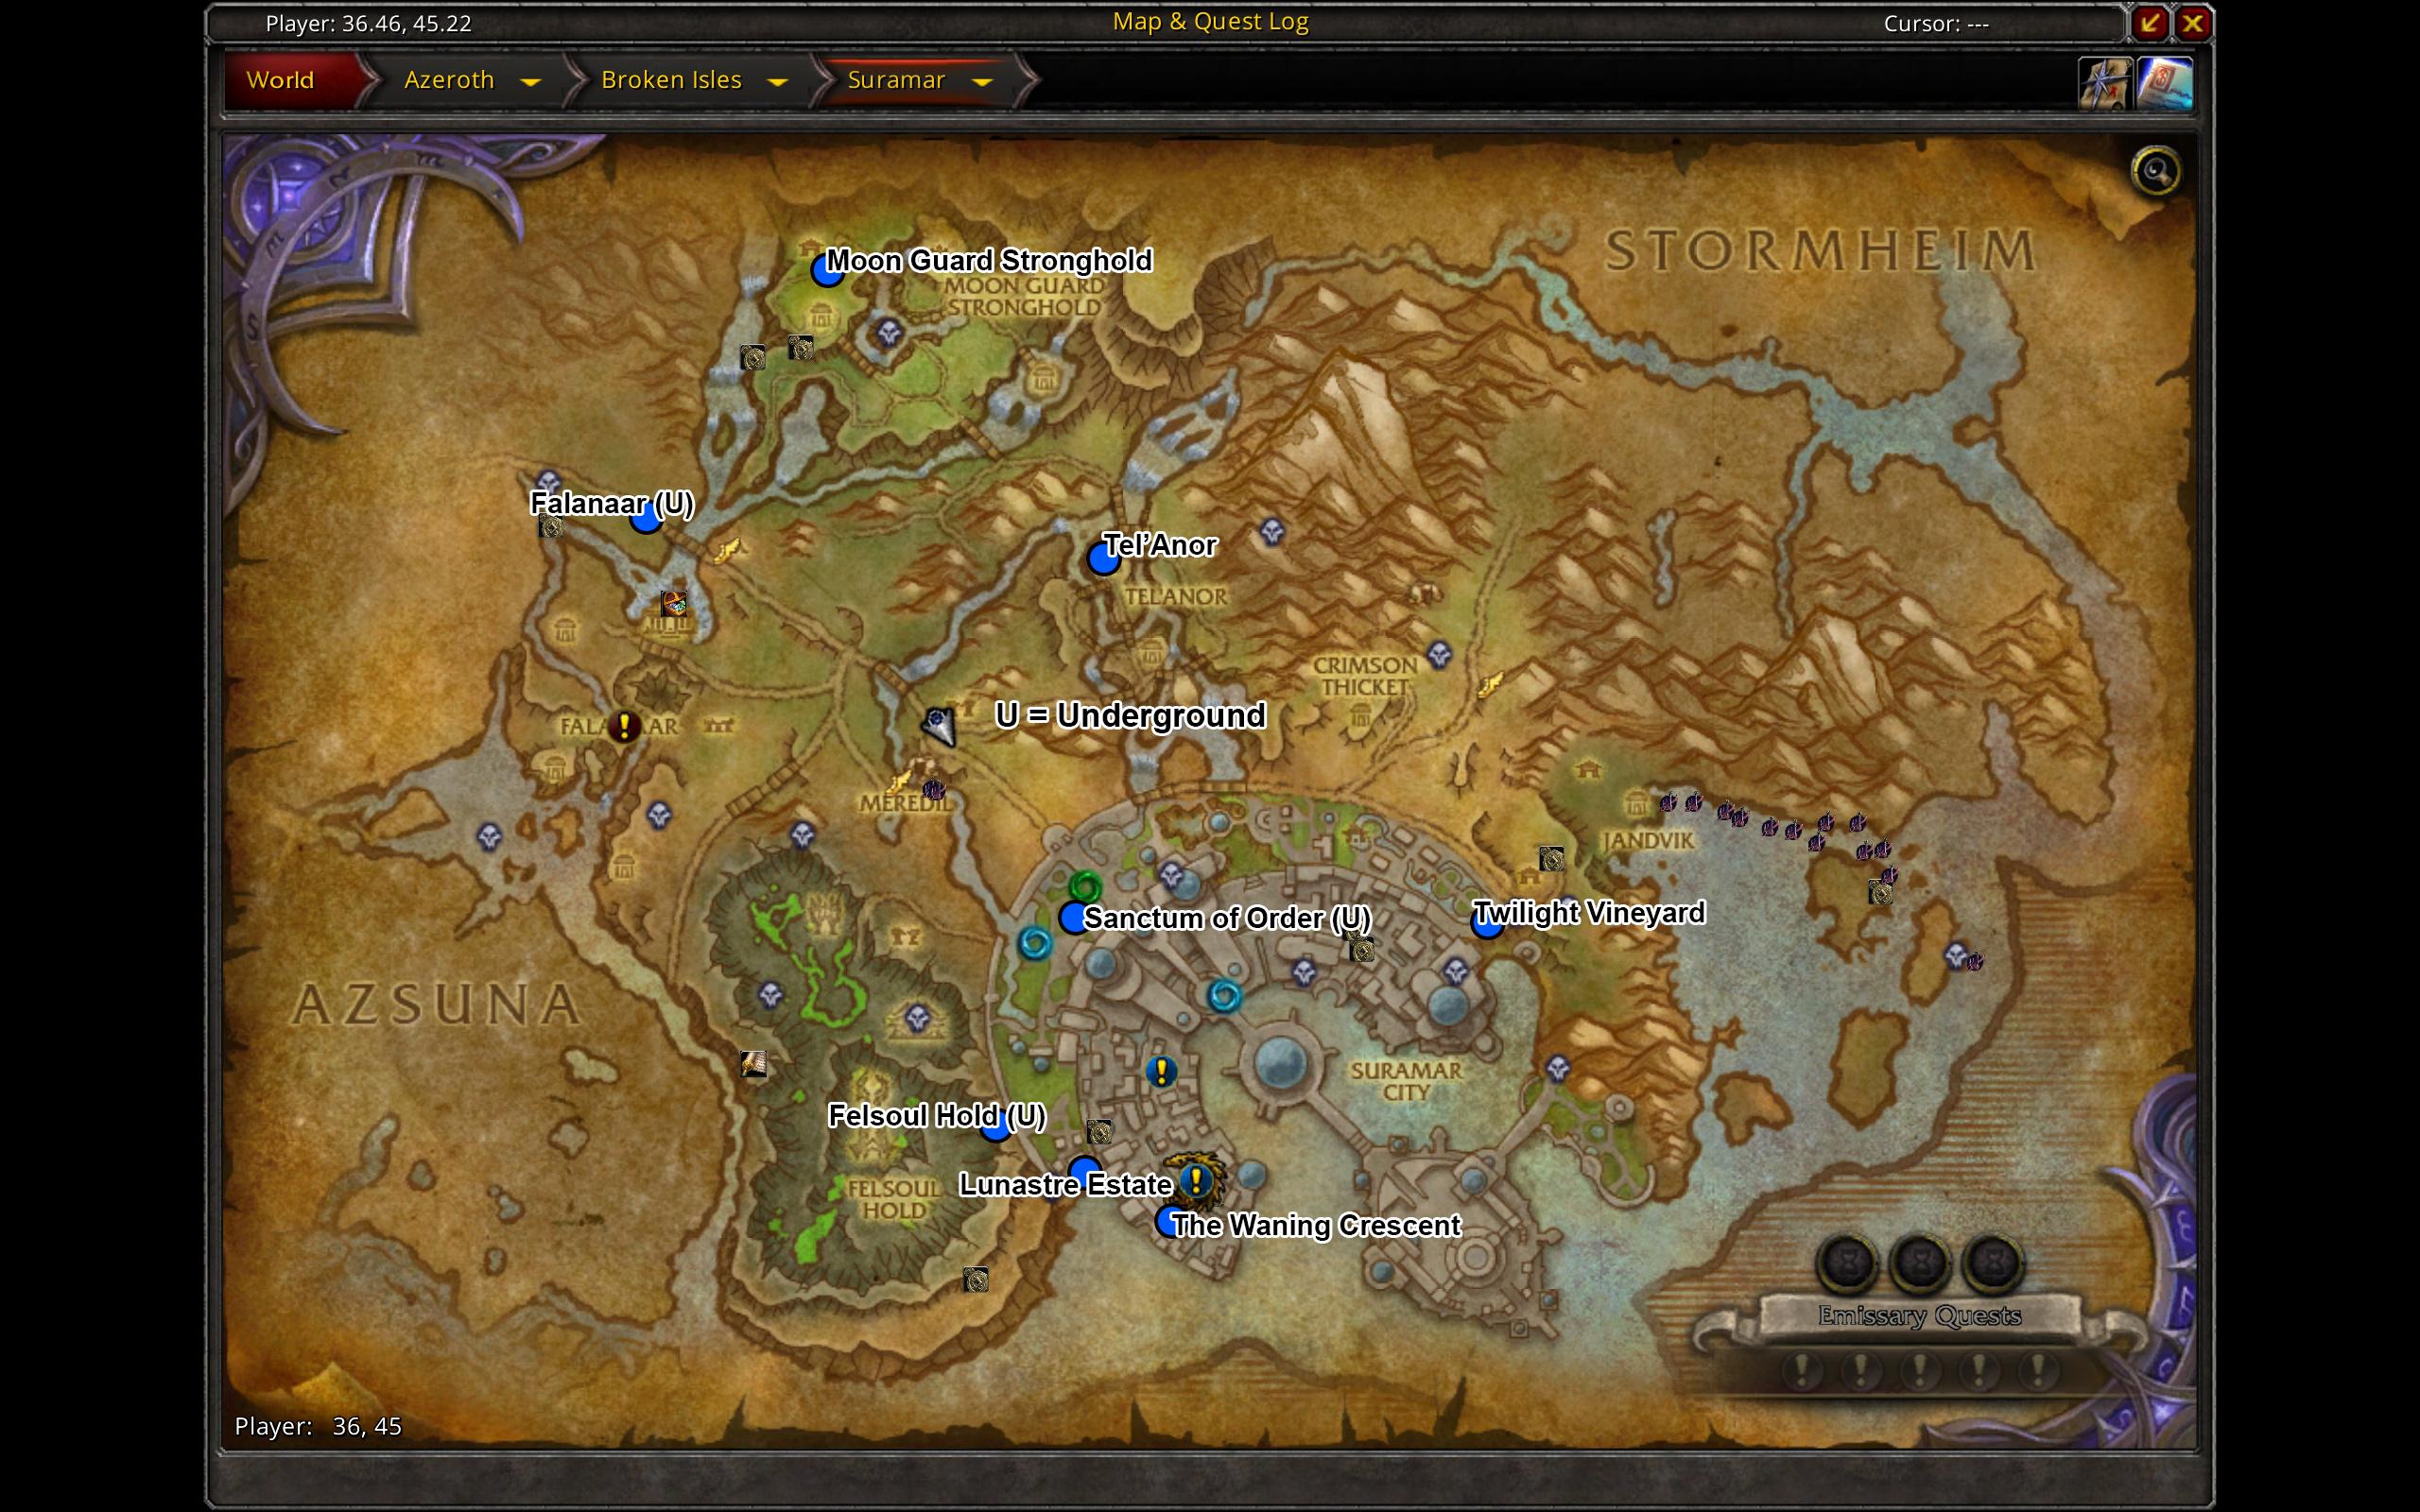 Complete Suramar Teleport Map Worldofwarcraft Blizzard Hearthstone Wow Warcraft Blizzardcs Gaming Map Environment Map World Of Warcraft